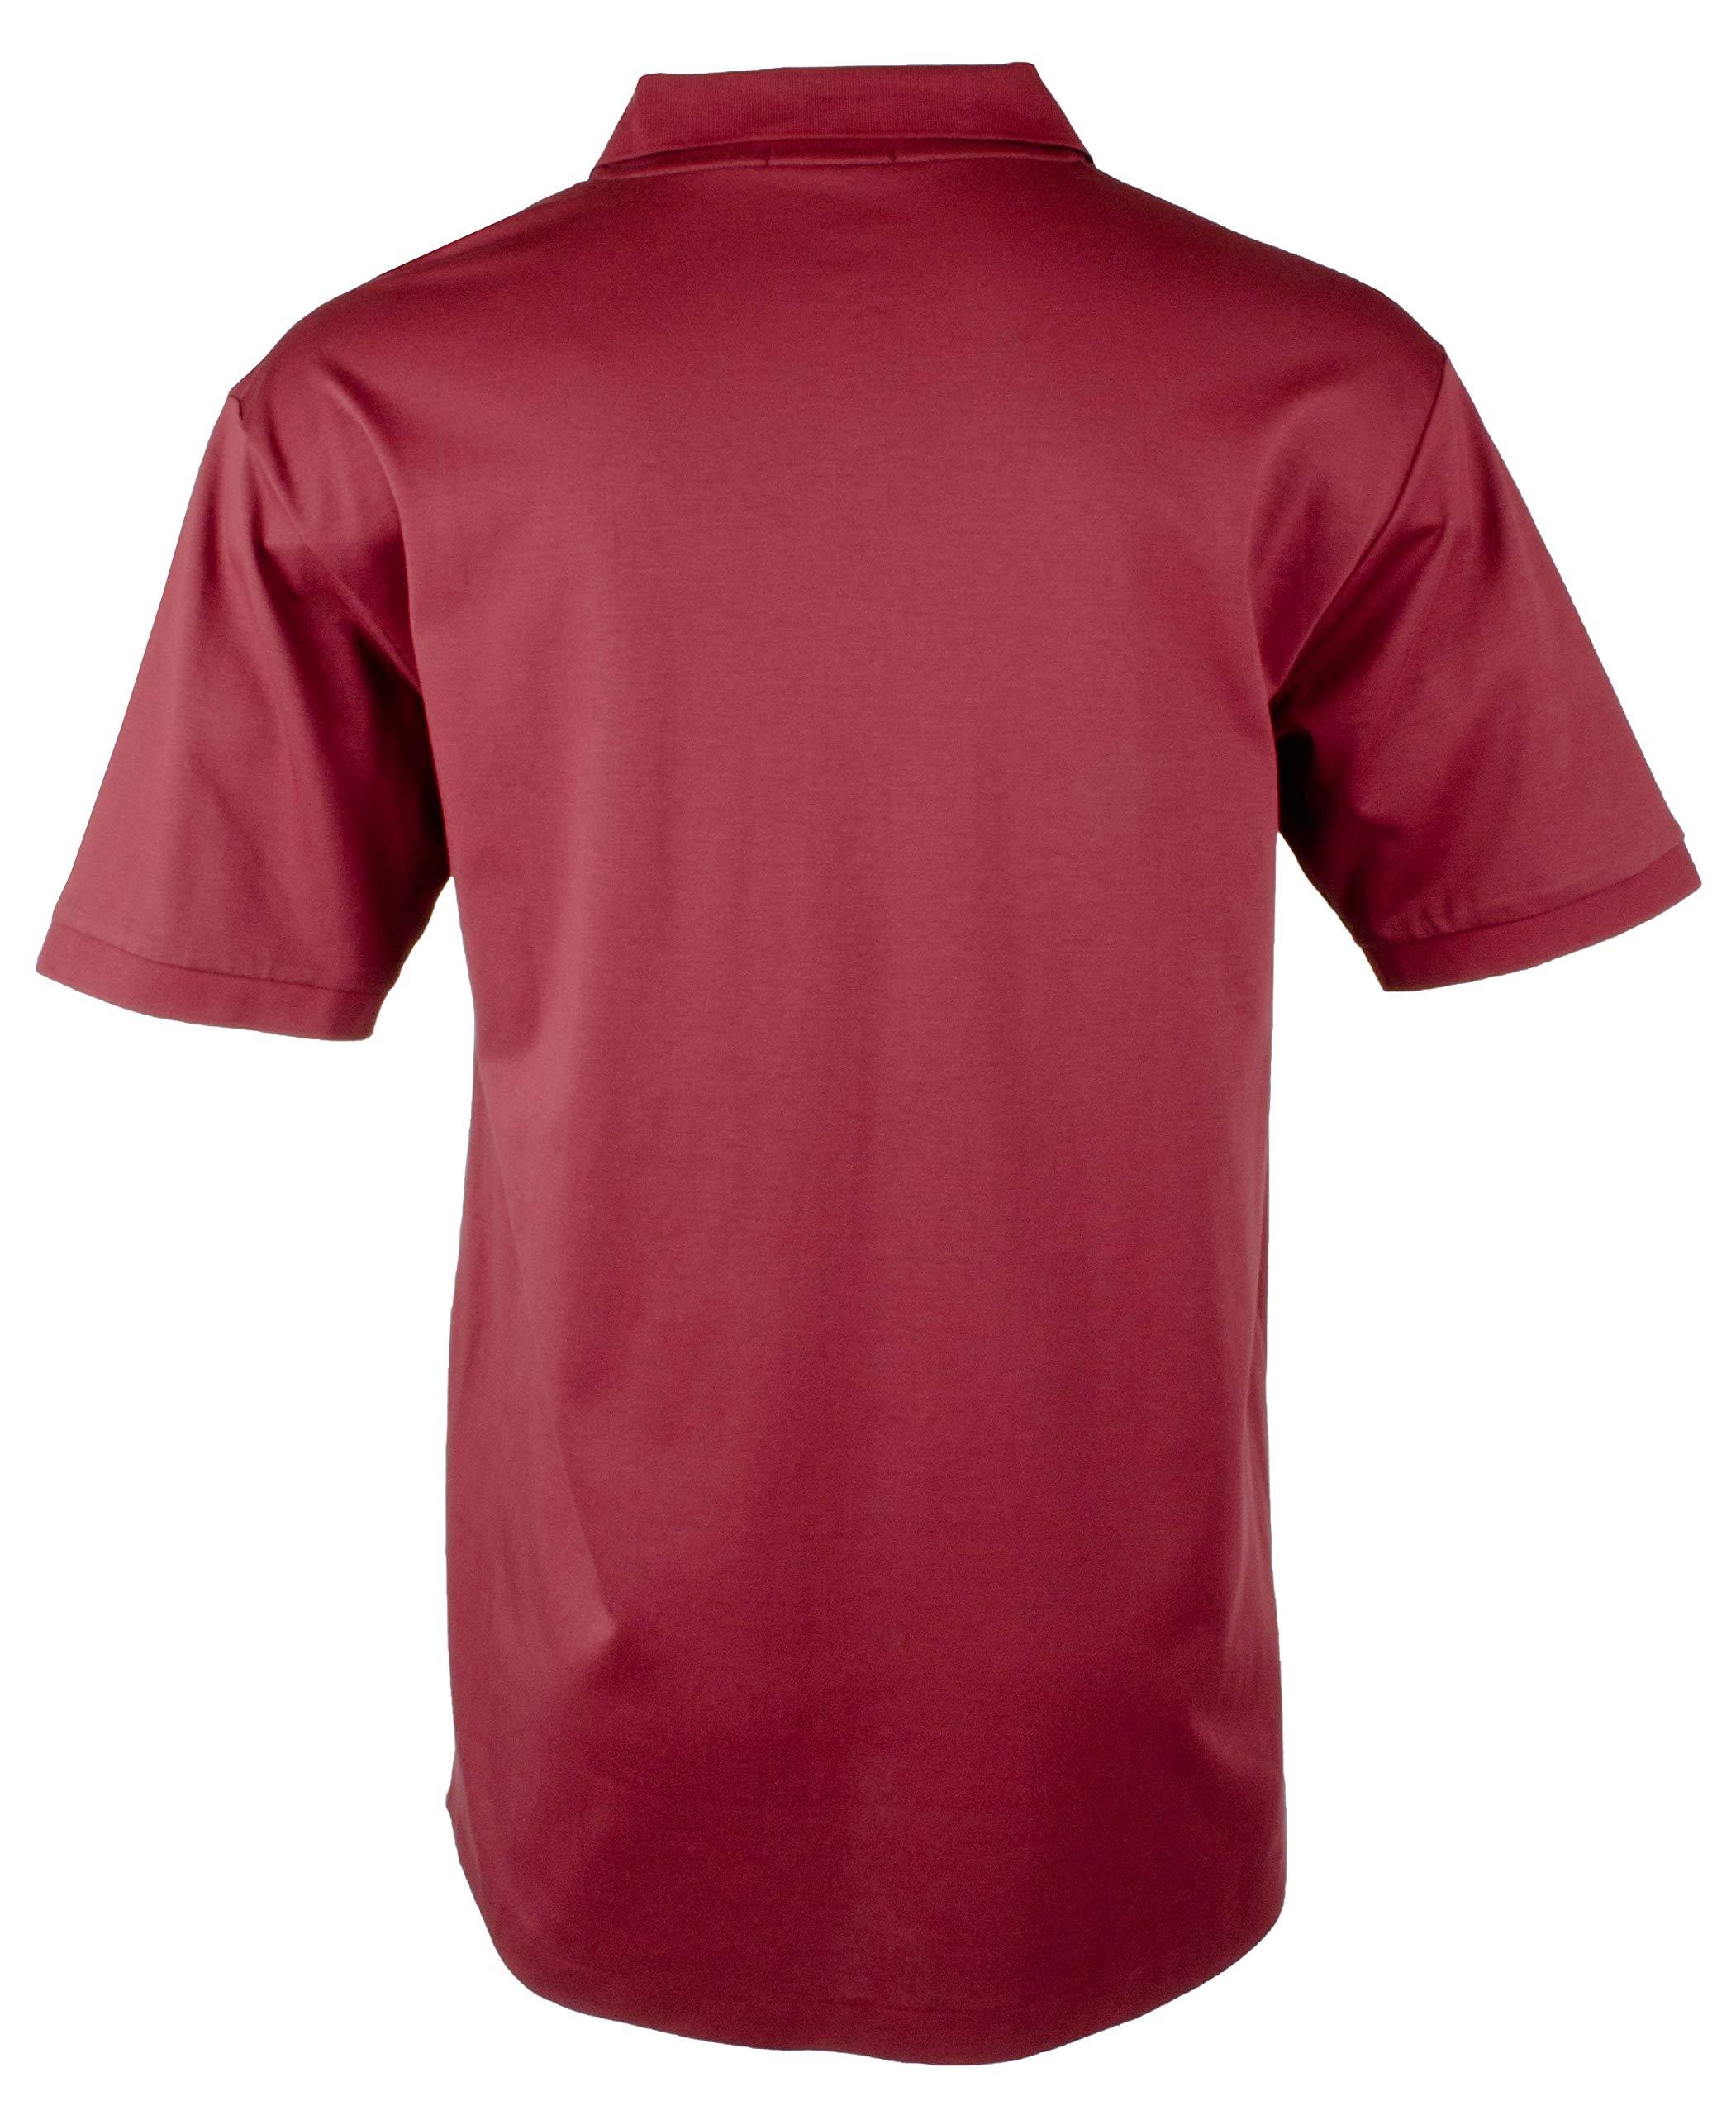 Polo Ralph Lauren Men's Big & Tall Classic Fit Cotton Soft Polo Shirt-R-3LT by Polo Ralph Lauren (Image #2)